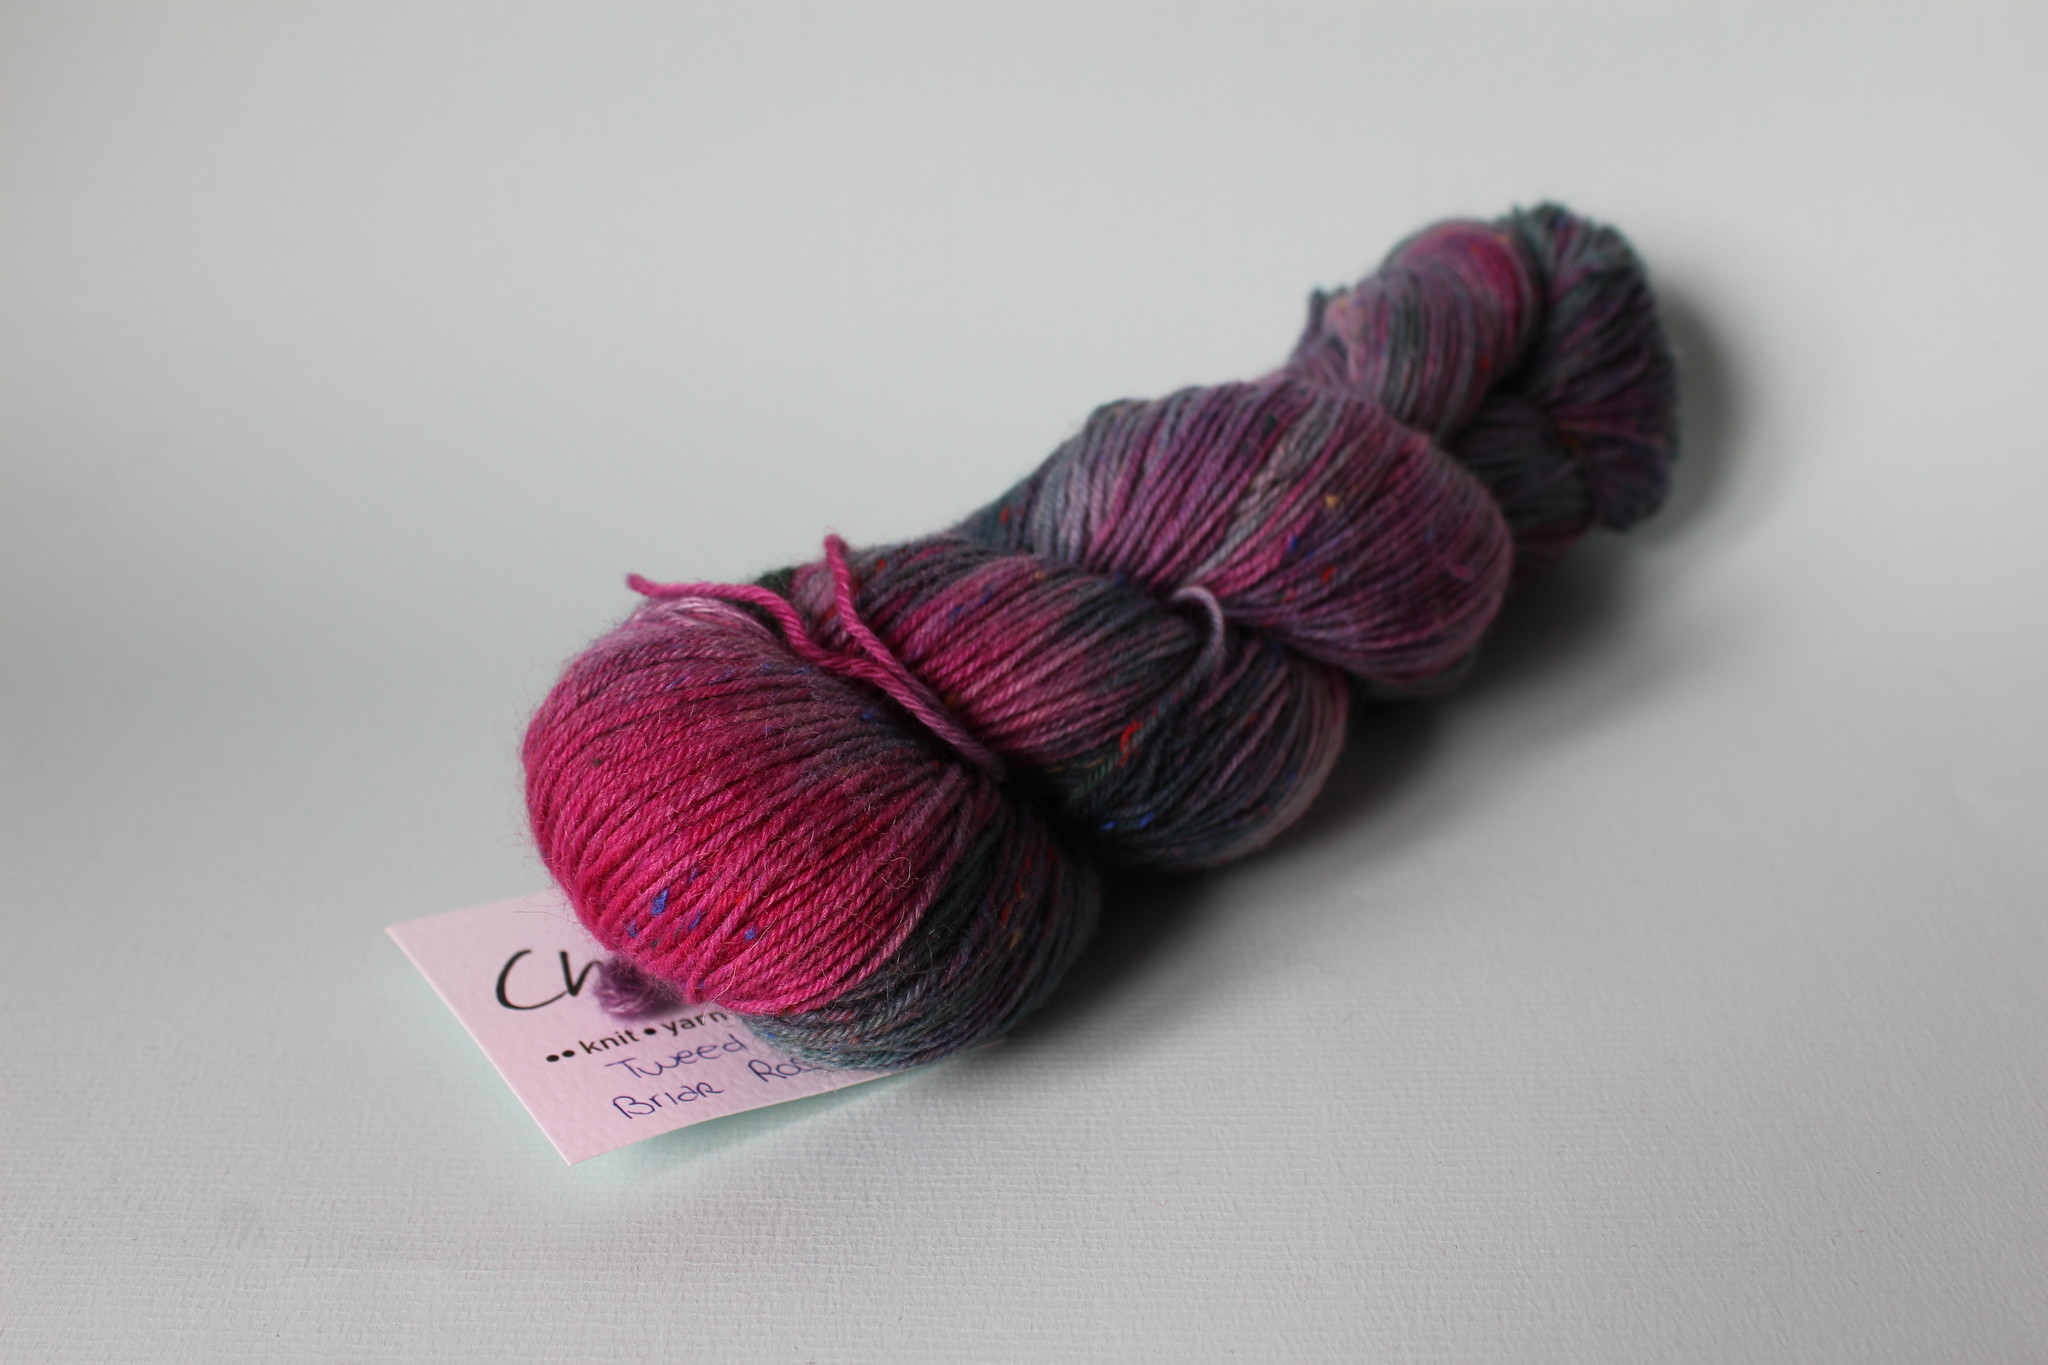 Chefwol's Finest Chefwol's Finest - Briar Rose - Tweed